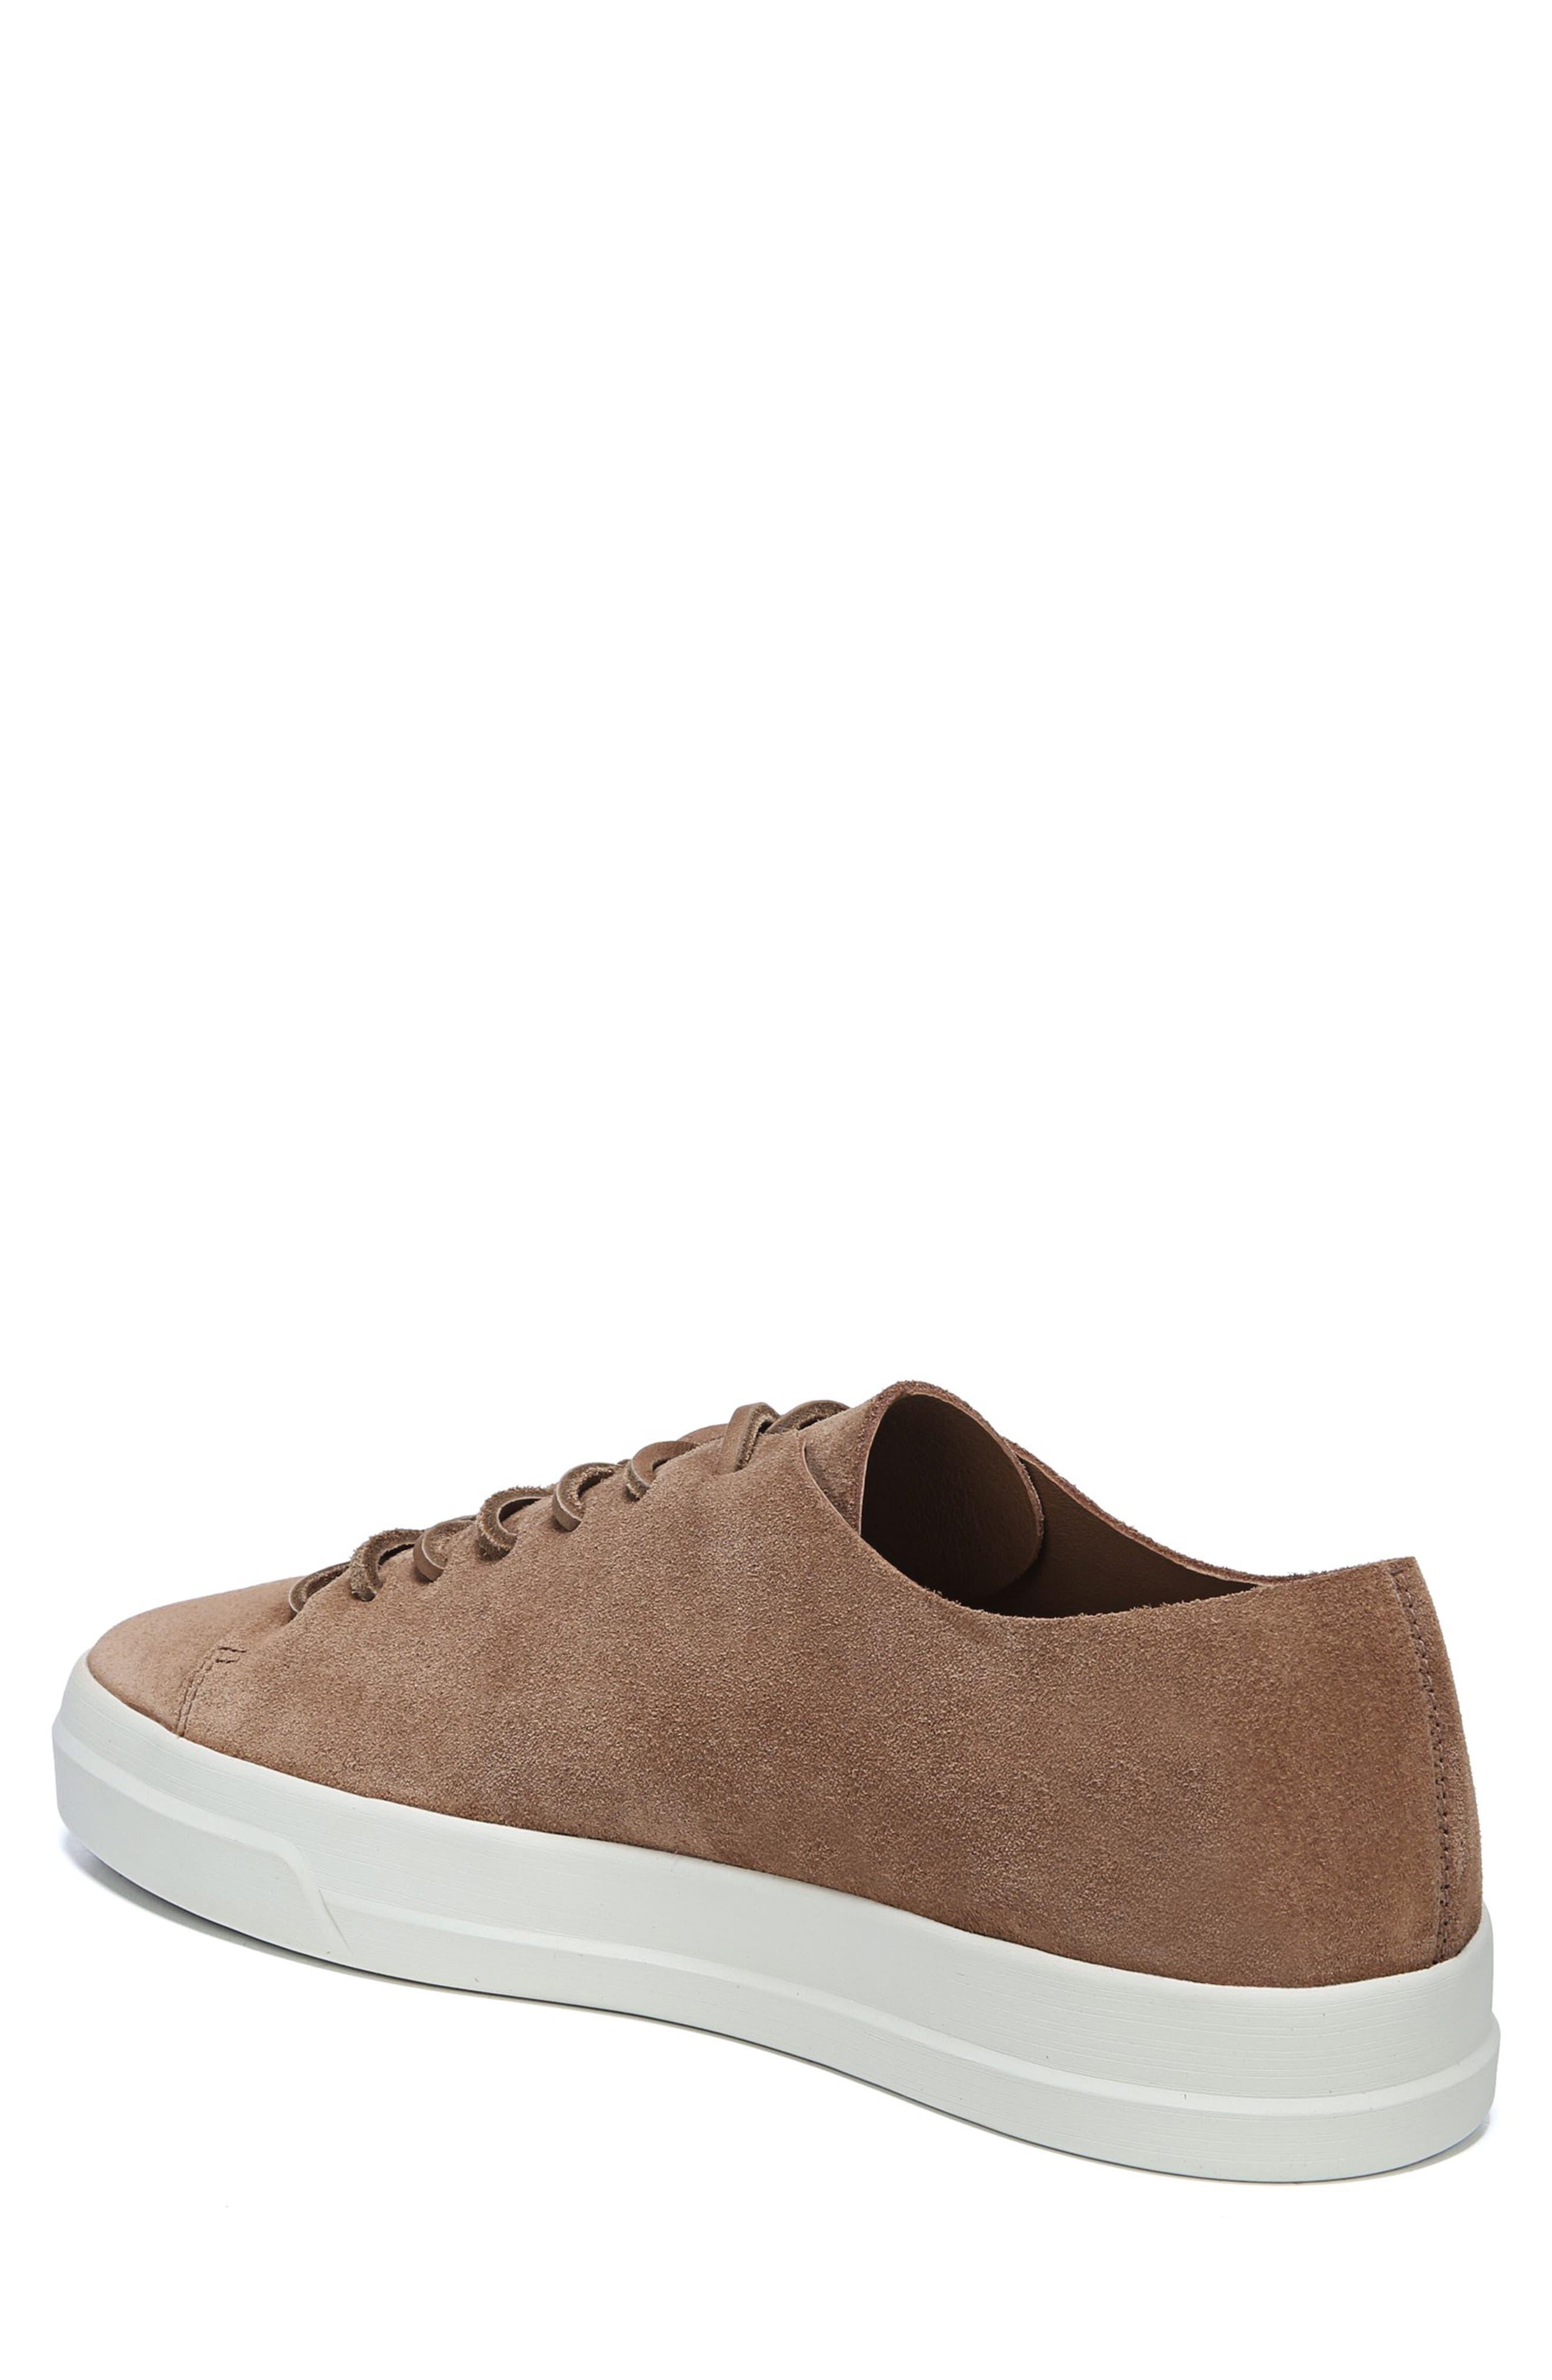 Copeland Sneaker,                             Alternate thumbnail 2, color,                             CEDAR